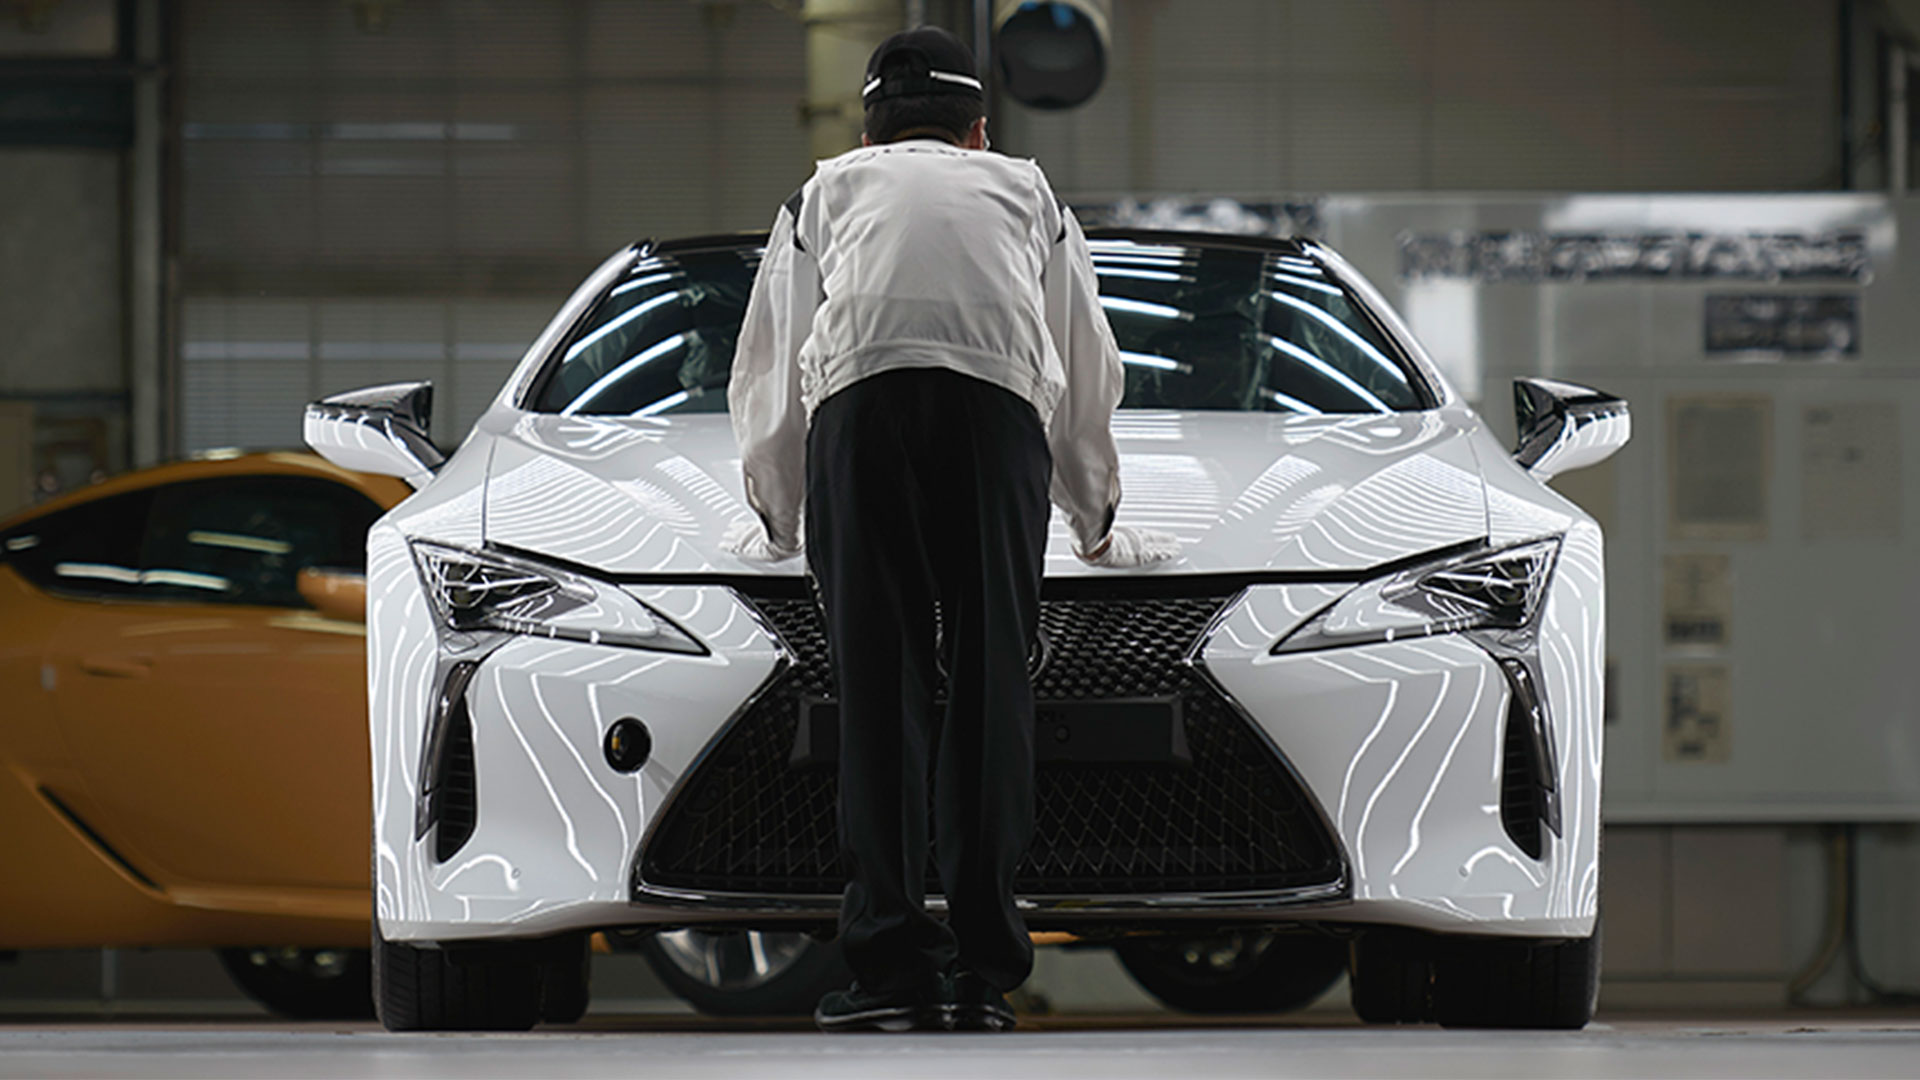 Lexus produccion hero asset